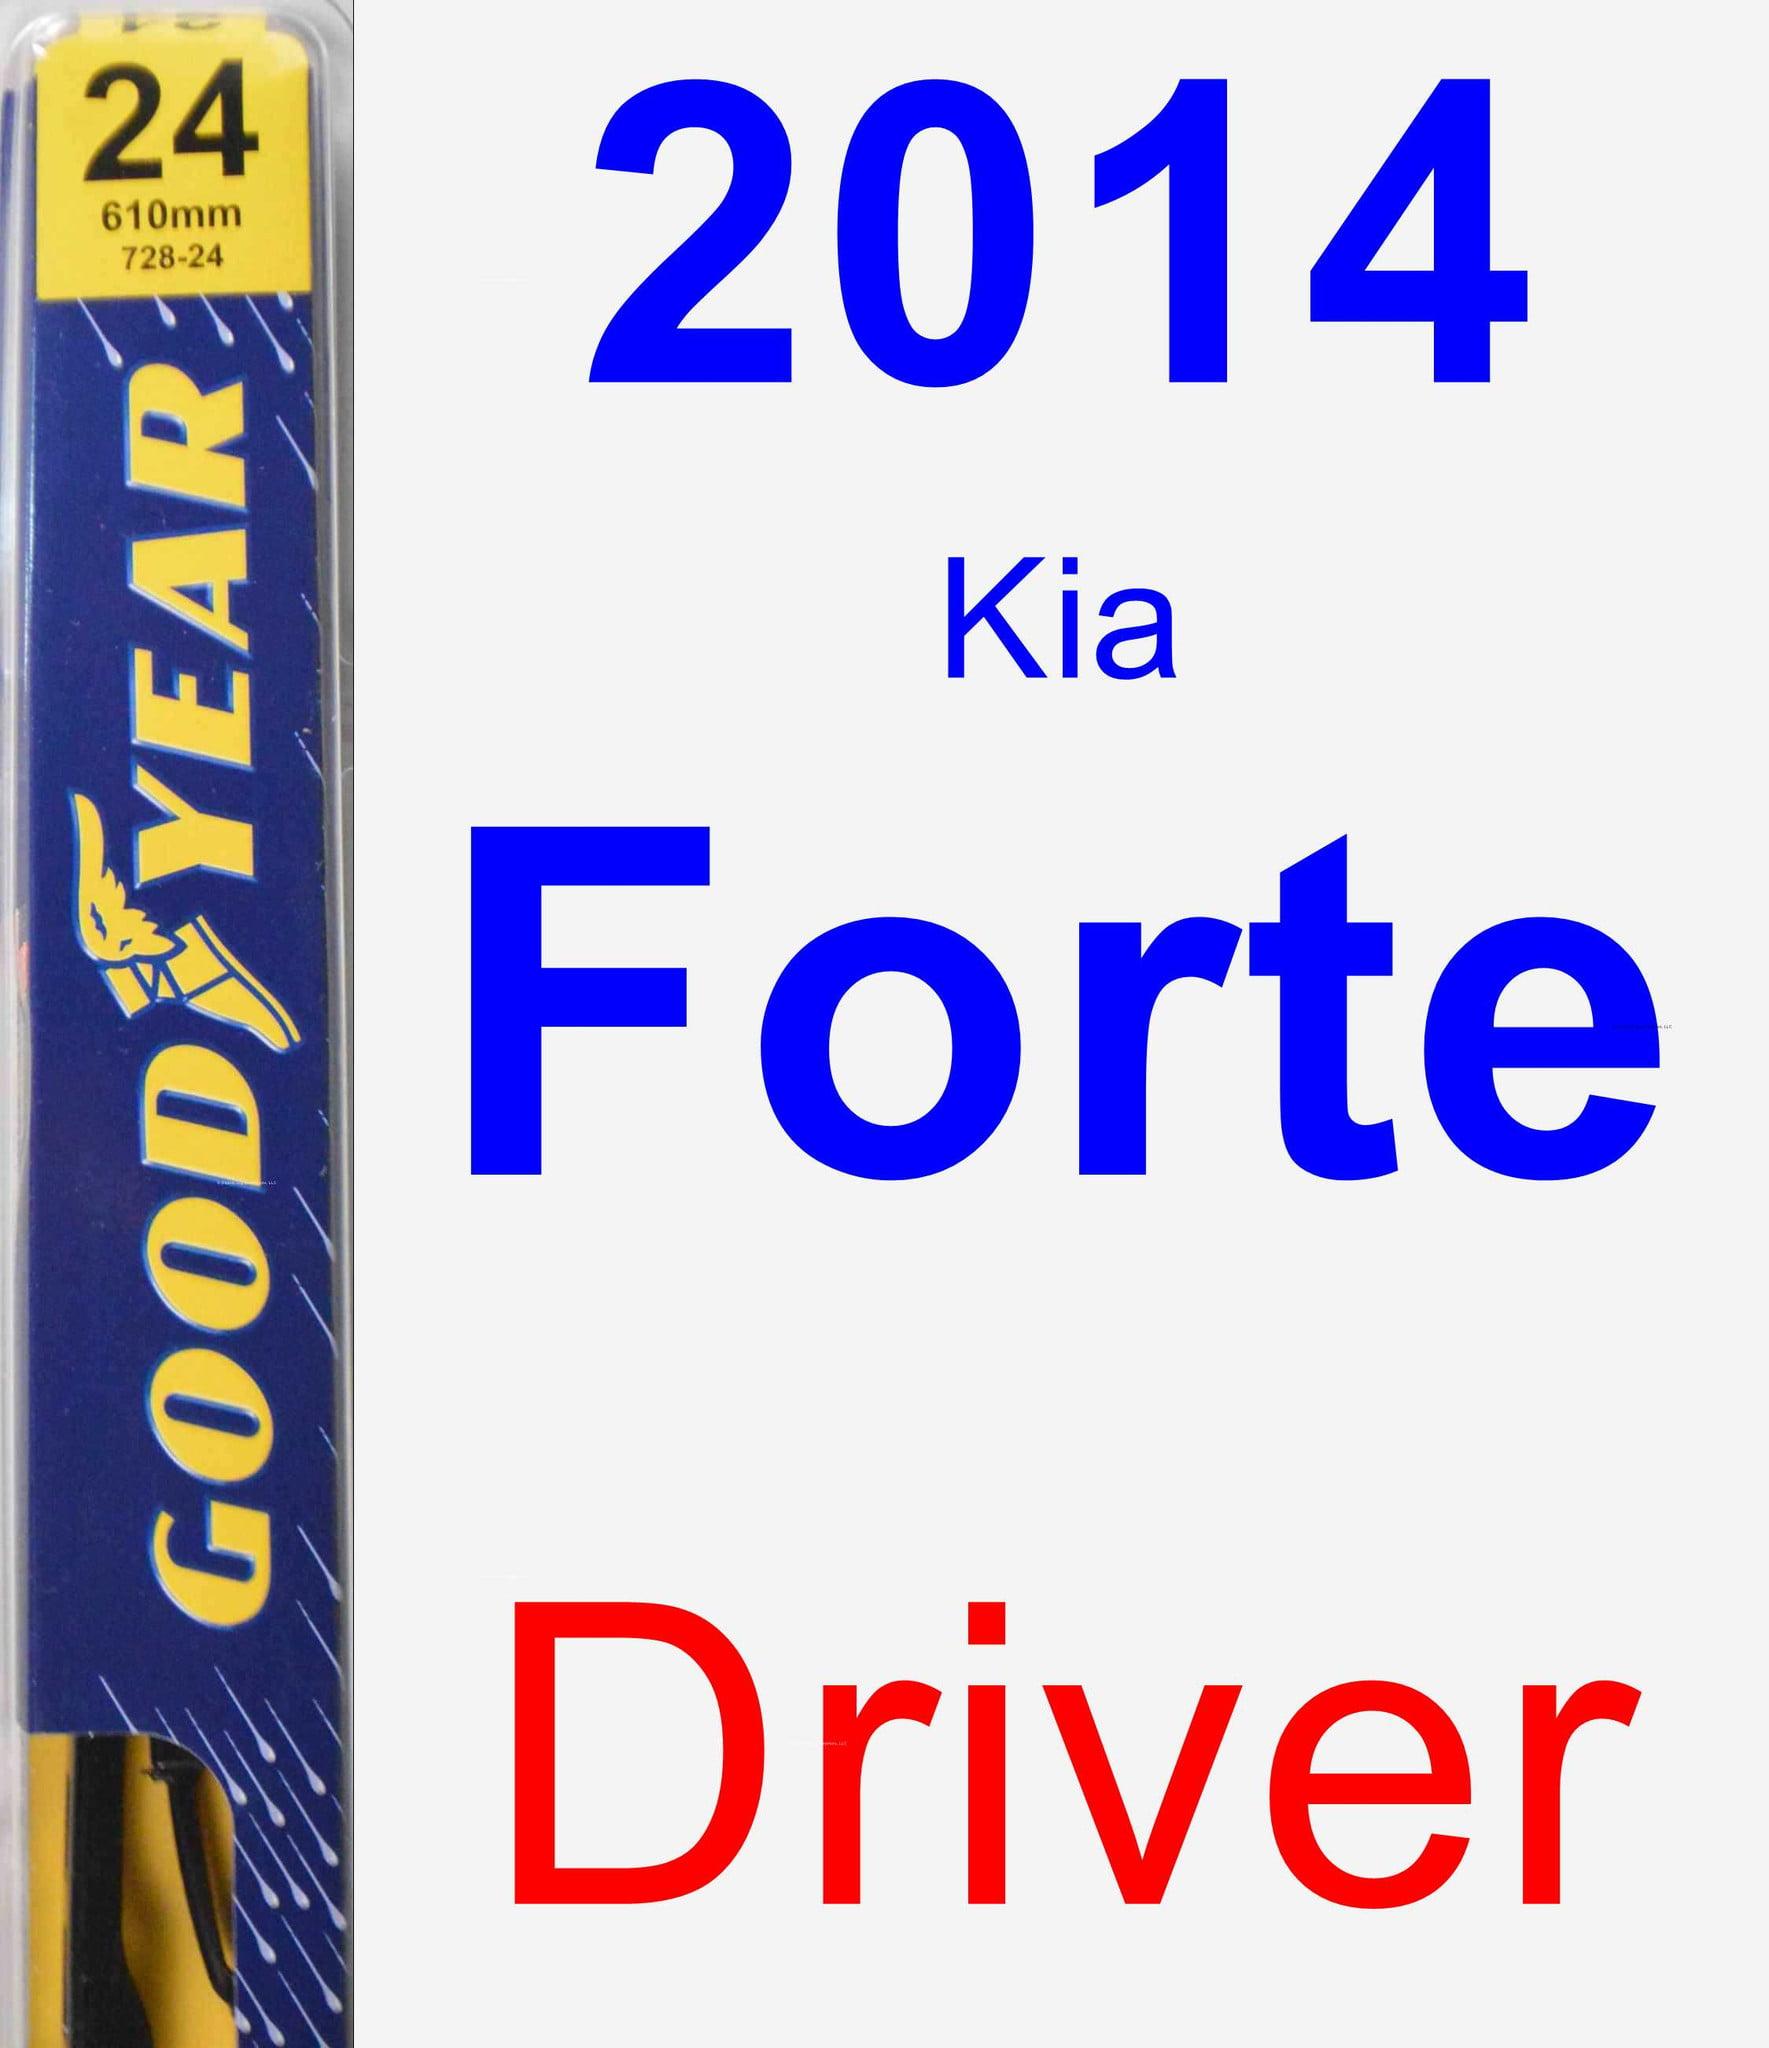 Front Windshield Premium All Season Wiper Blades Set for KIA FORTE 2014